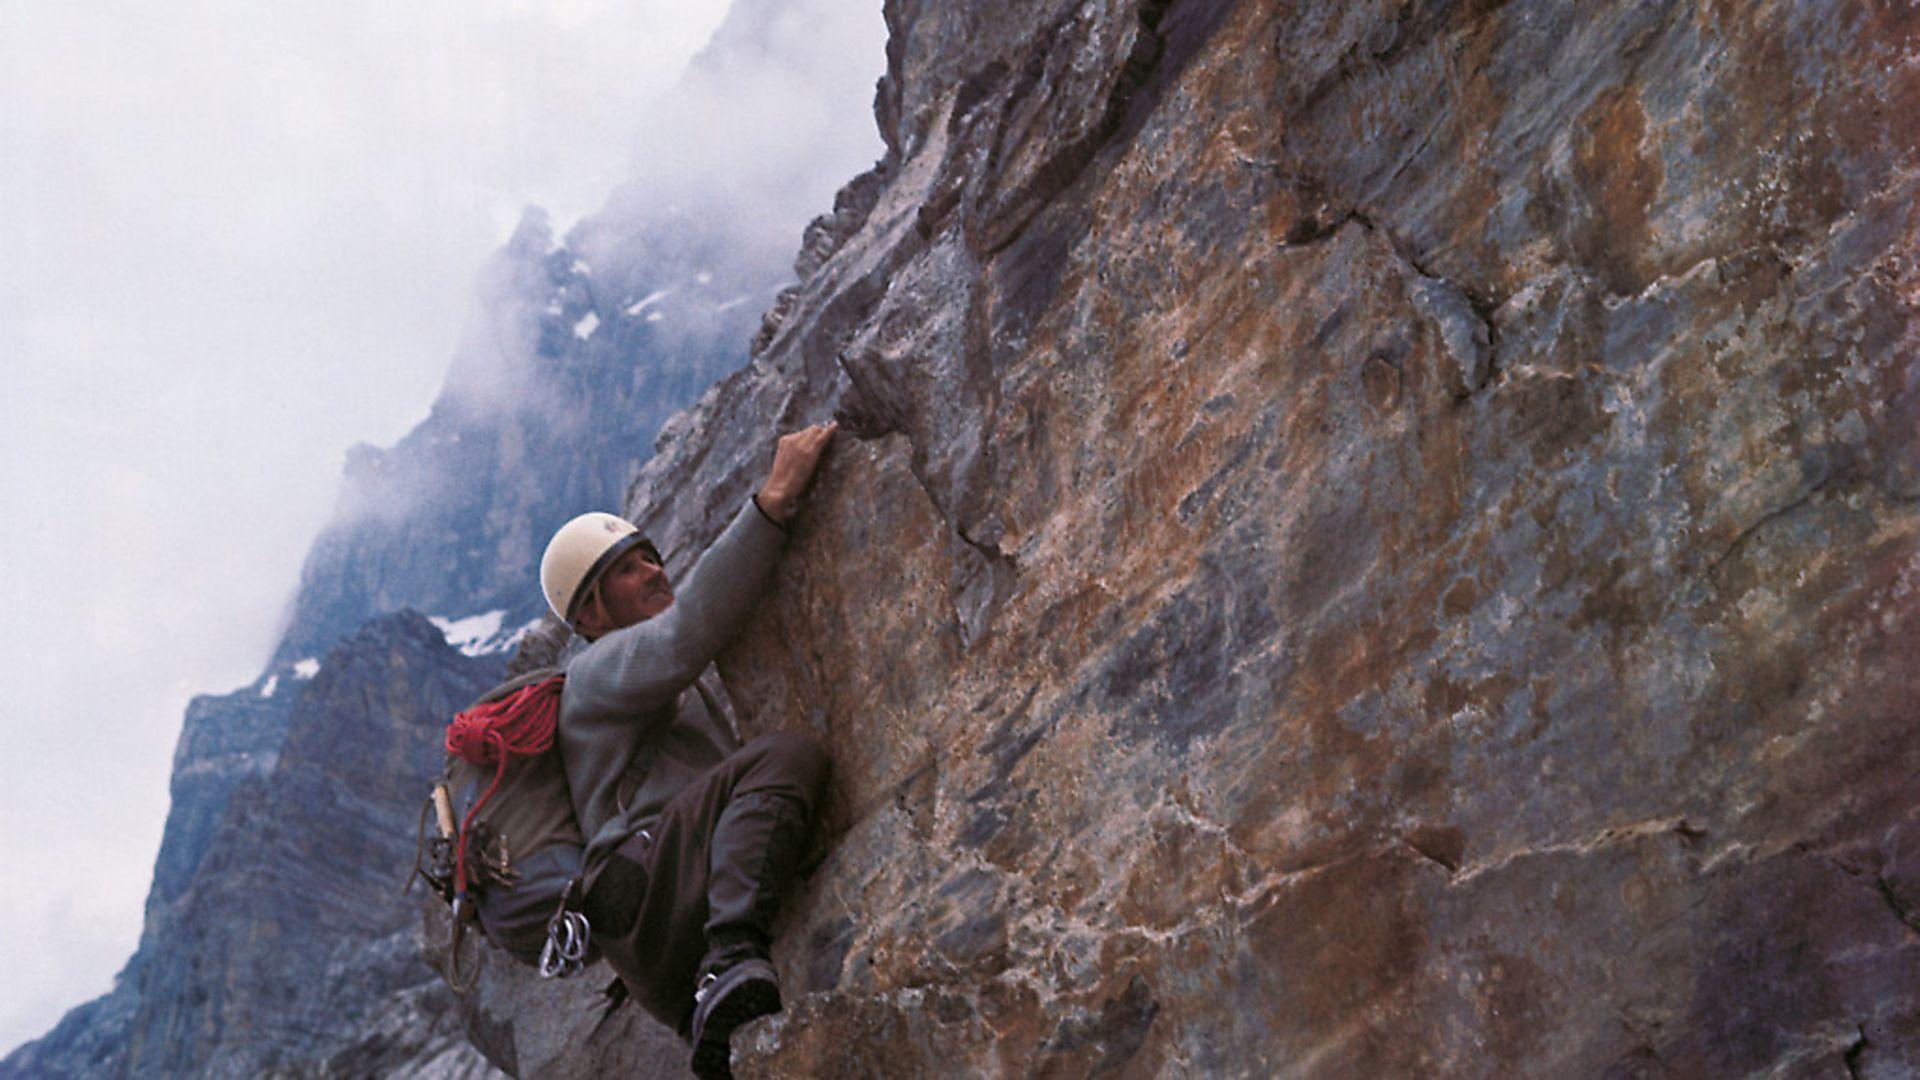 The Italian mountaineer Walter Bonatti training on Kleine Scheidegg before facing the climb to Mont Blanc. Switzerland, 1963 (Photo by Mario De BiasiMondadori Portfolio by Getty Images) - Credit: Mondadori via Getty Images